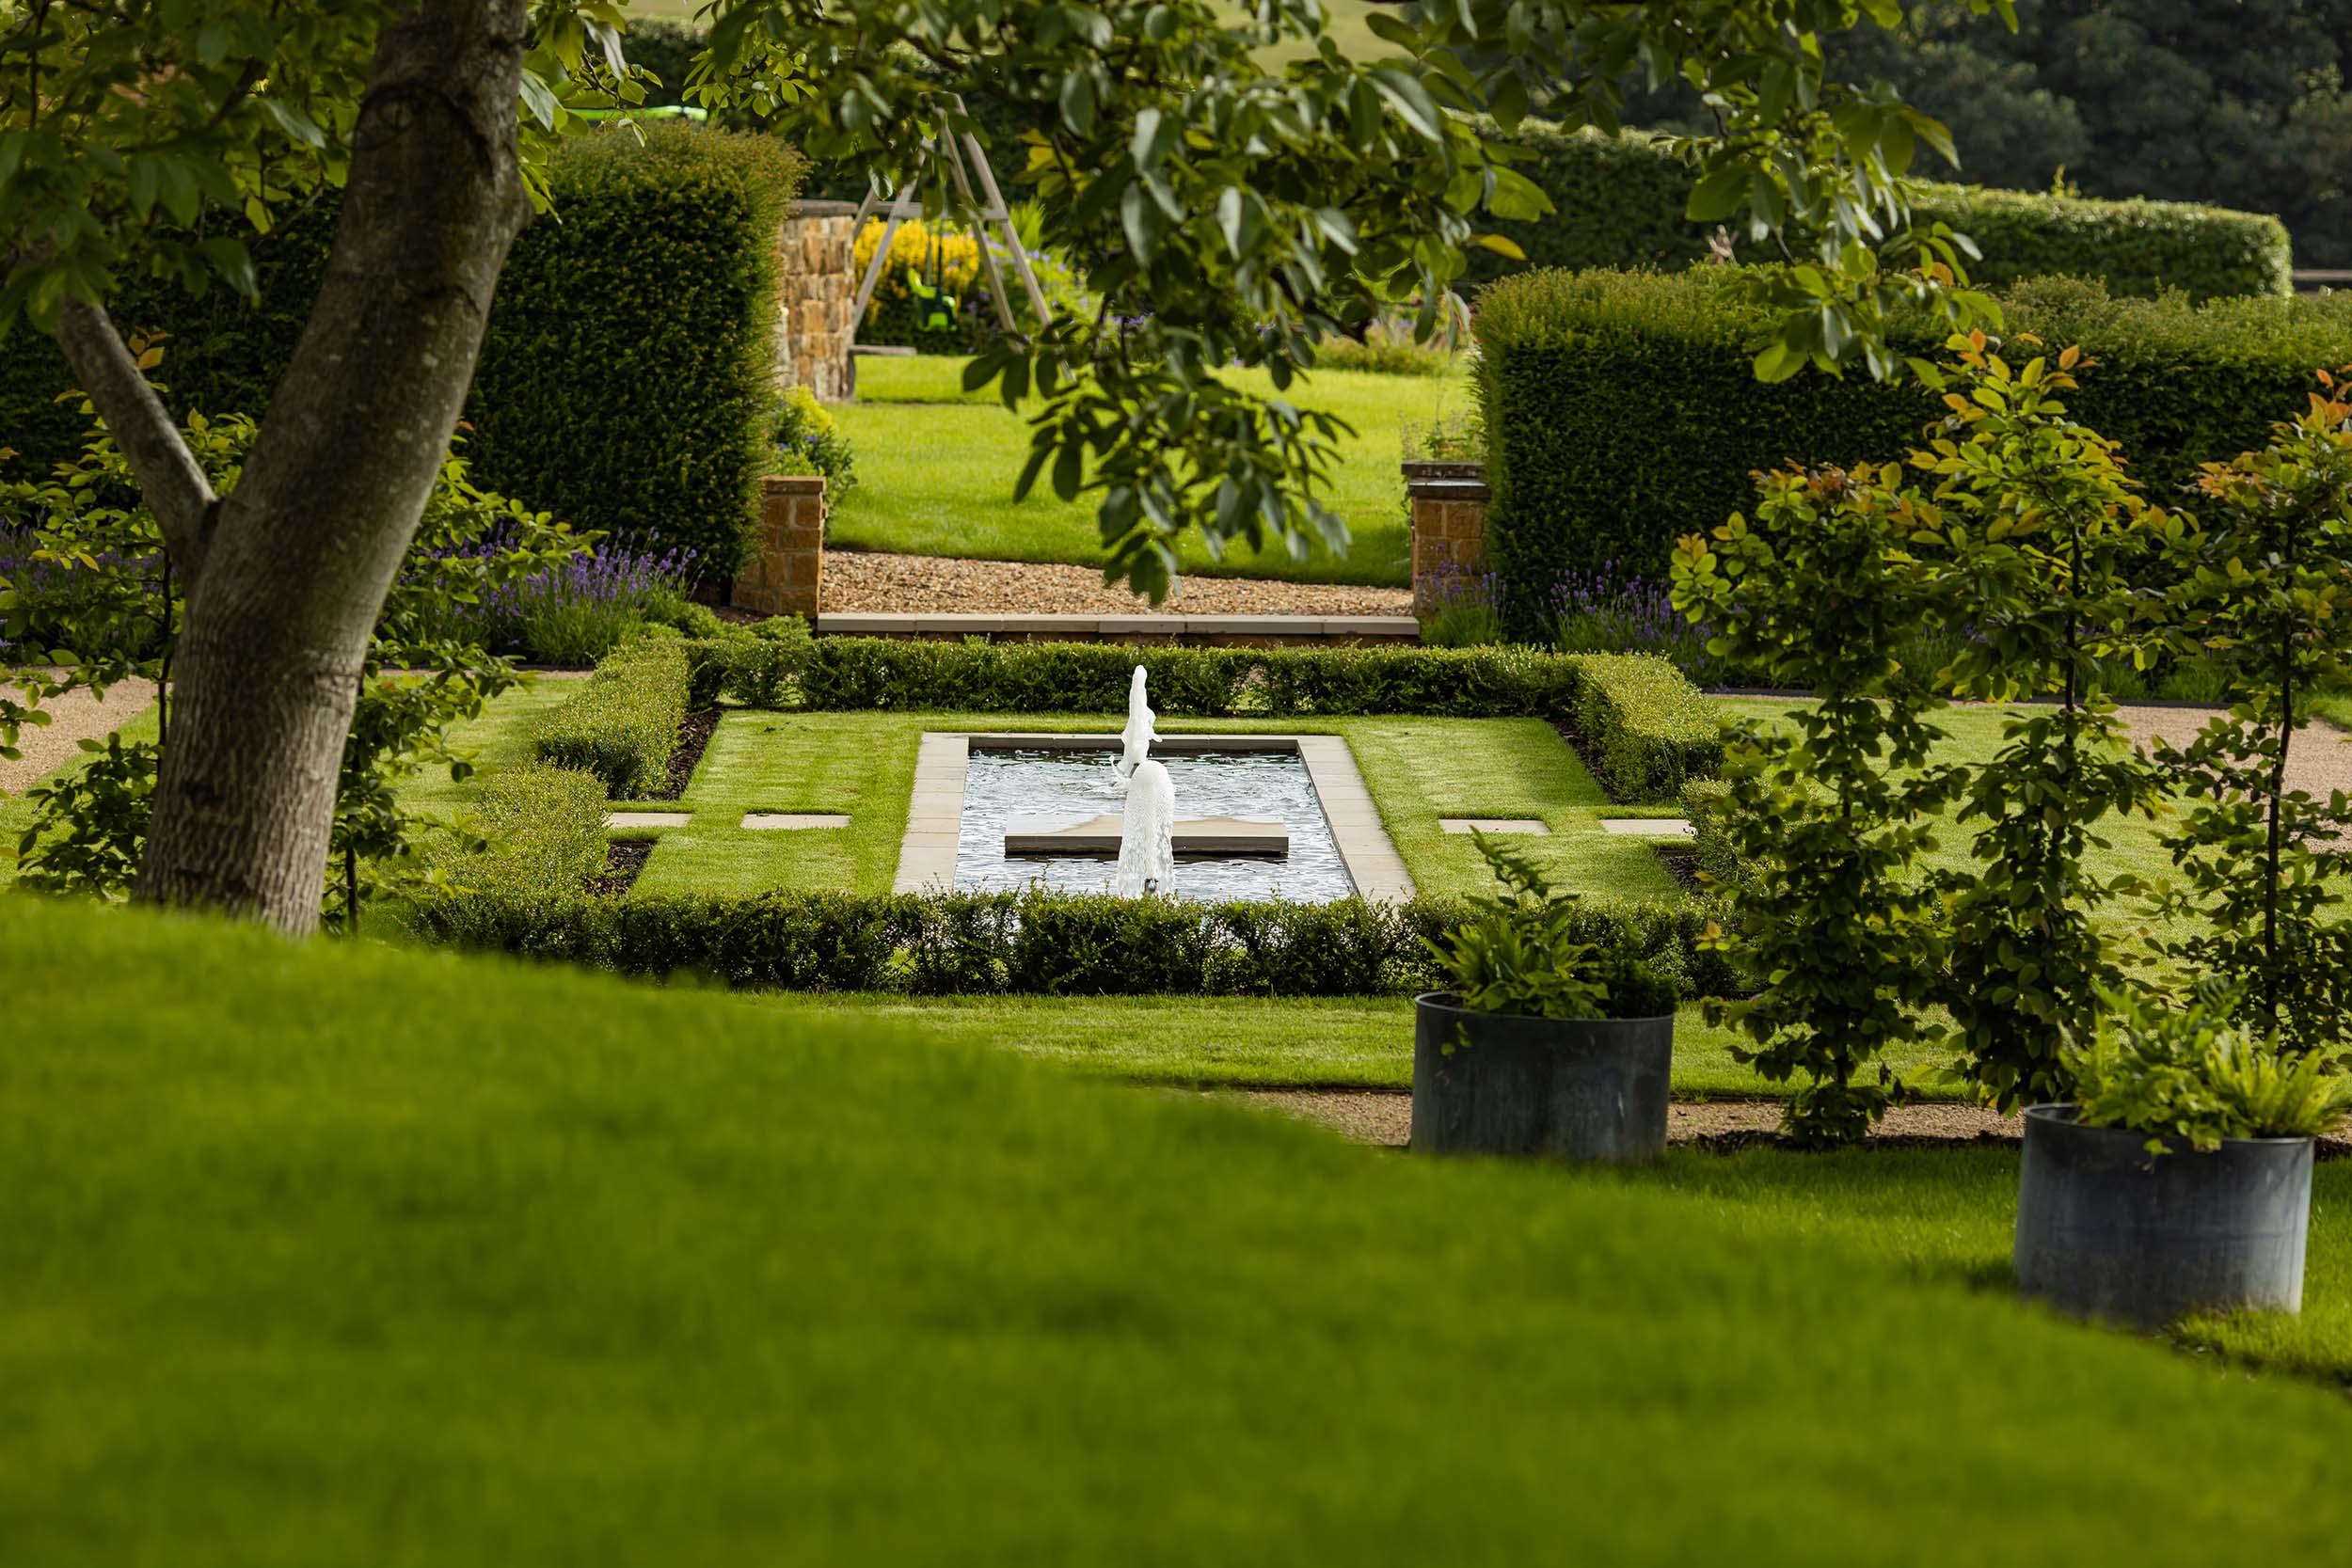 Nicholsons Garden - Lockdown For The Grandchildren 6